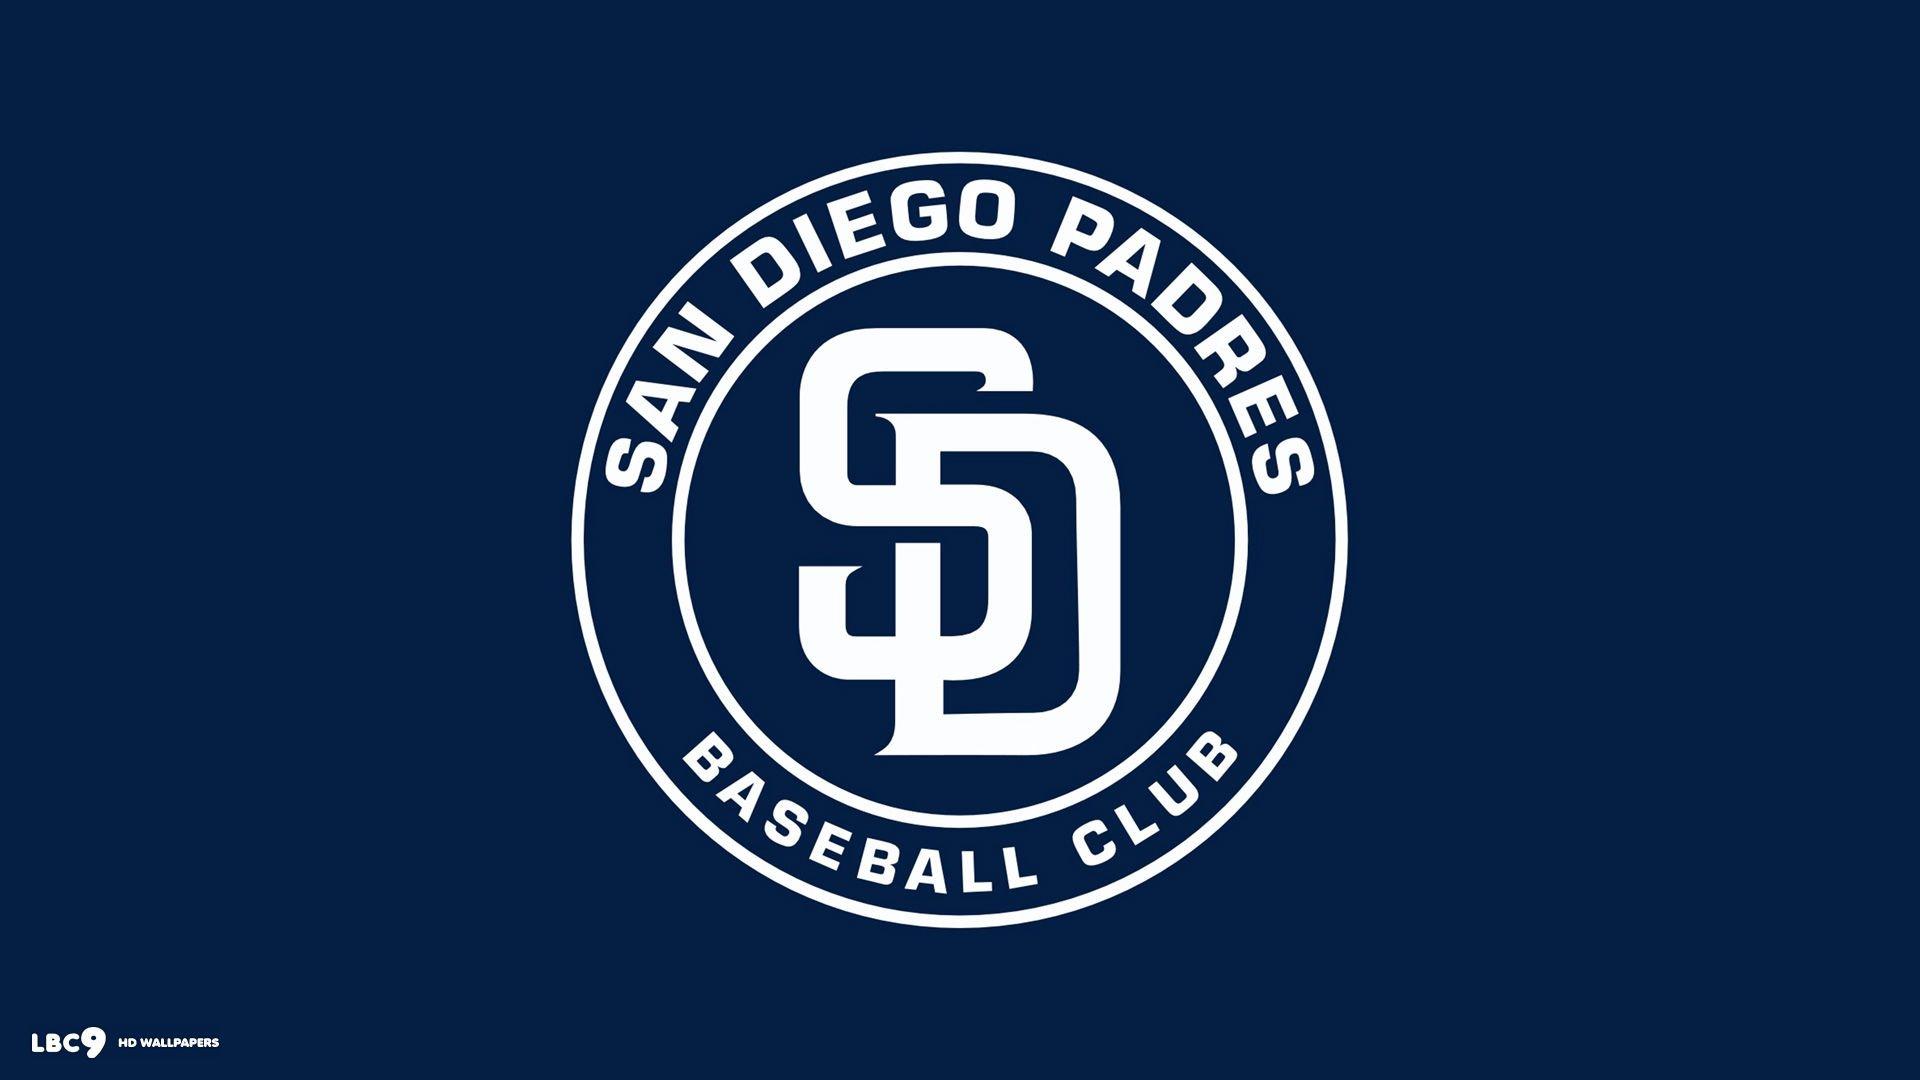 SAN DIEGO PADRES mlb baseball 4 wallpaper 1920x1080 231819 1920x1080